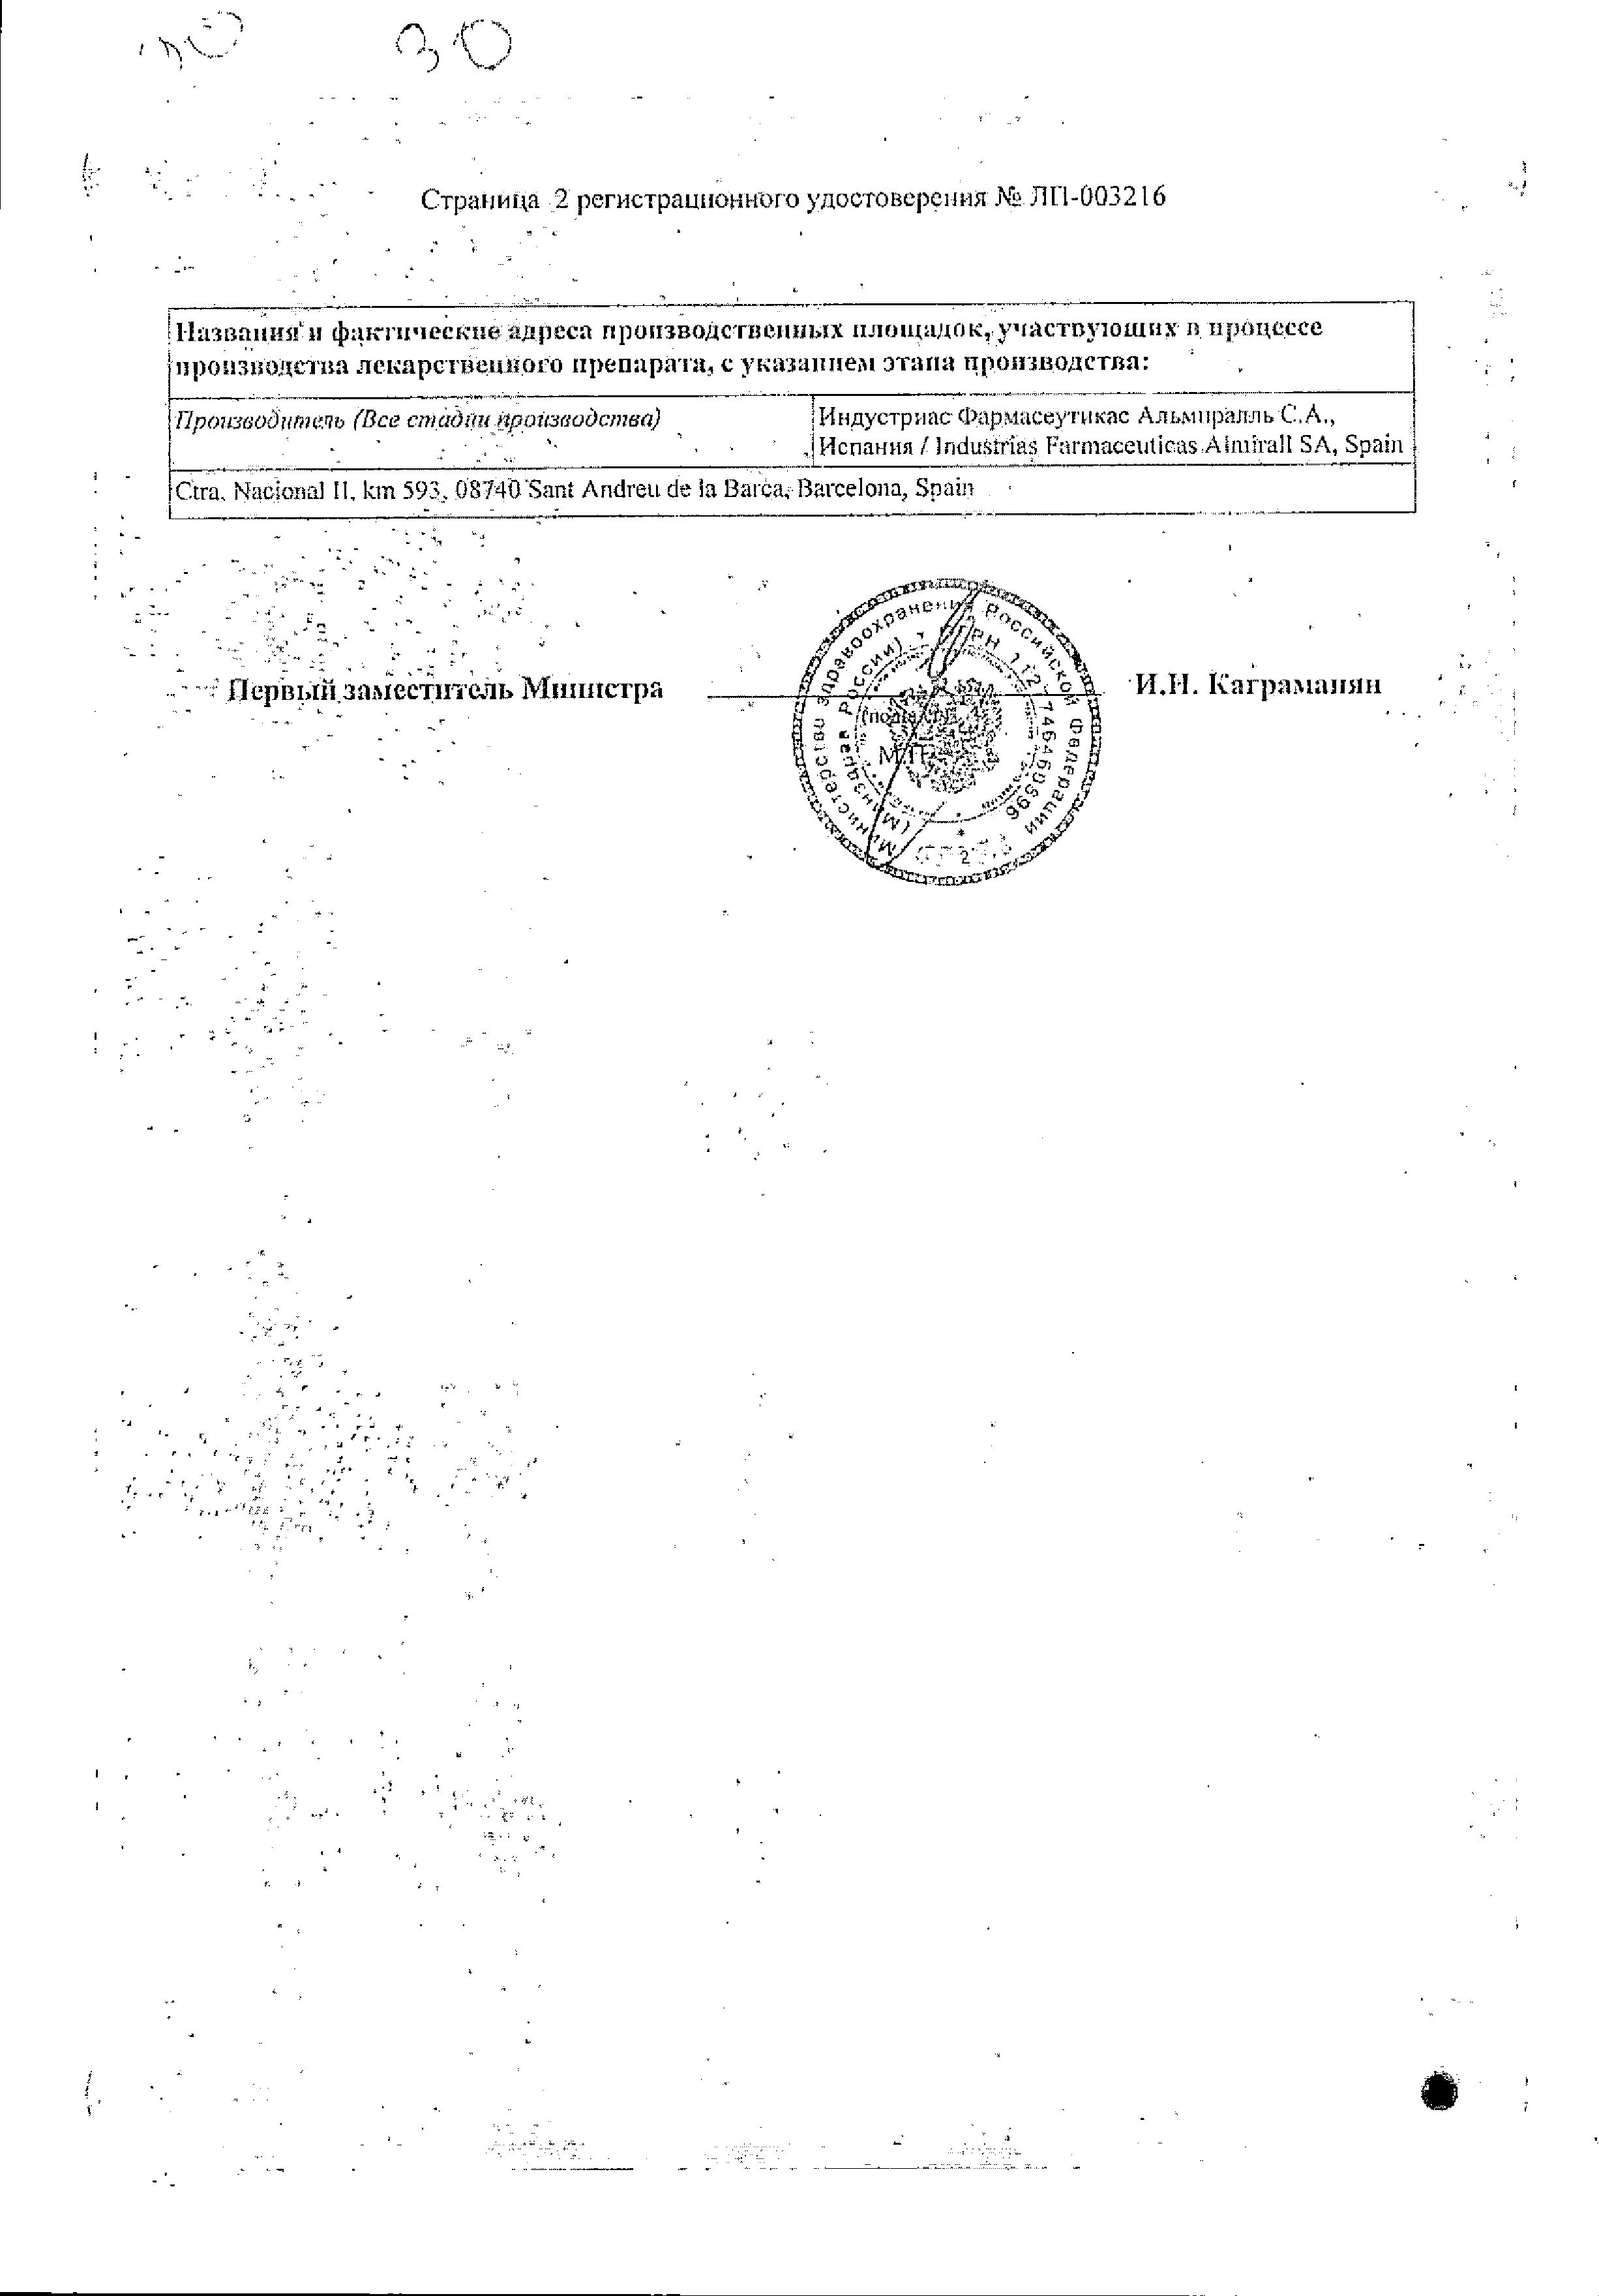 Бретарис Дженуэйр сертификат